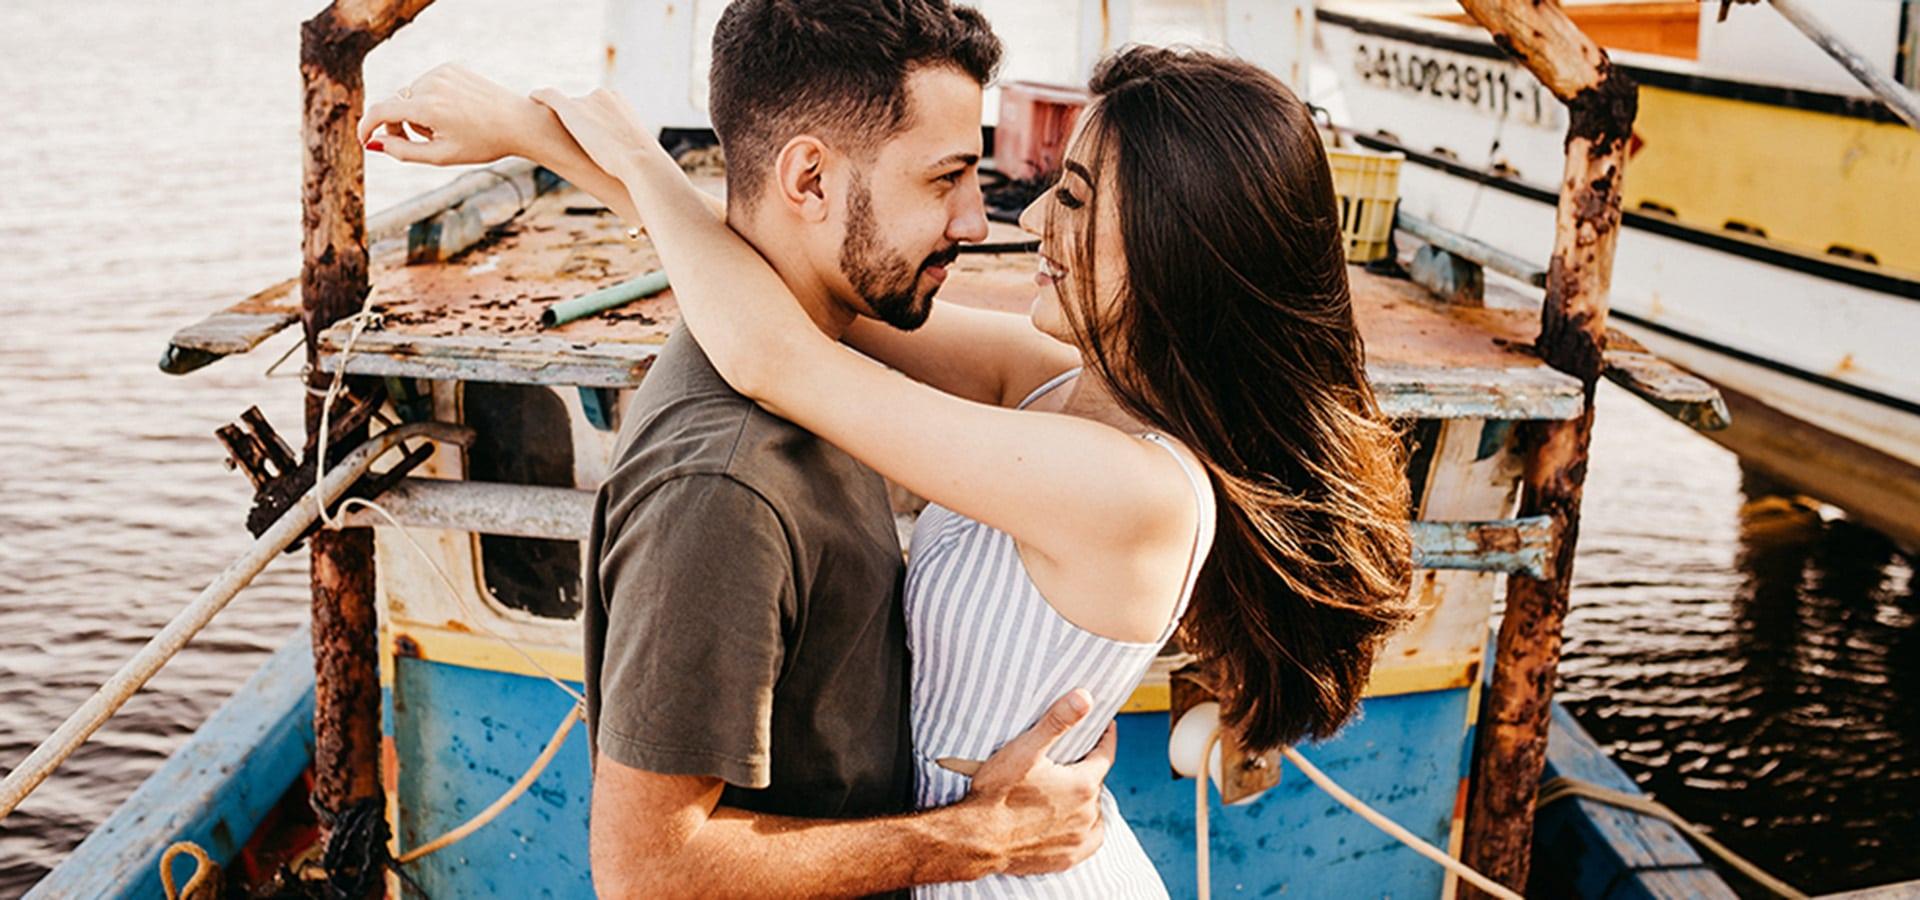 Hero image for 10 Mini-Honeymoon Ideas that Don't Involve Travelling